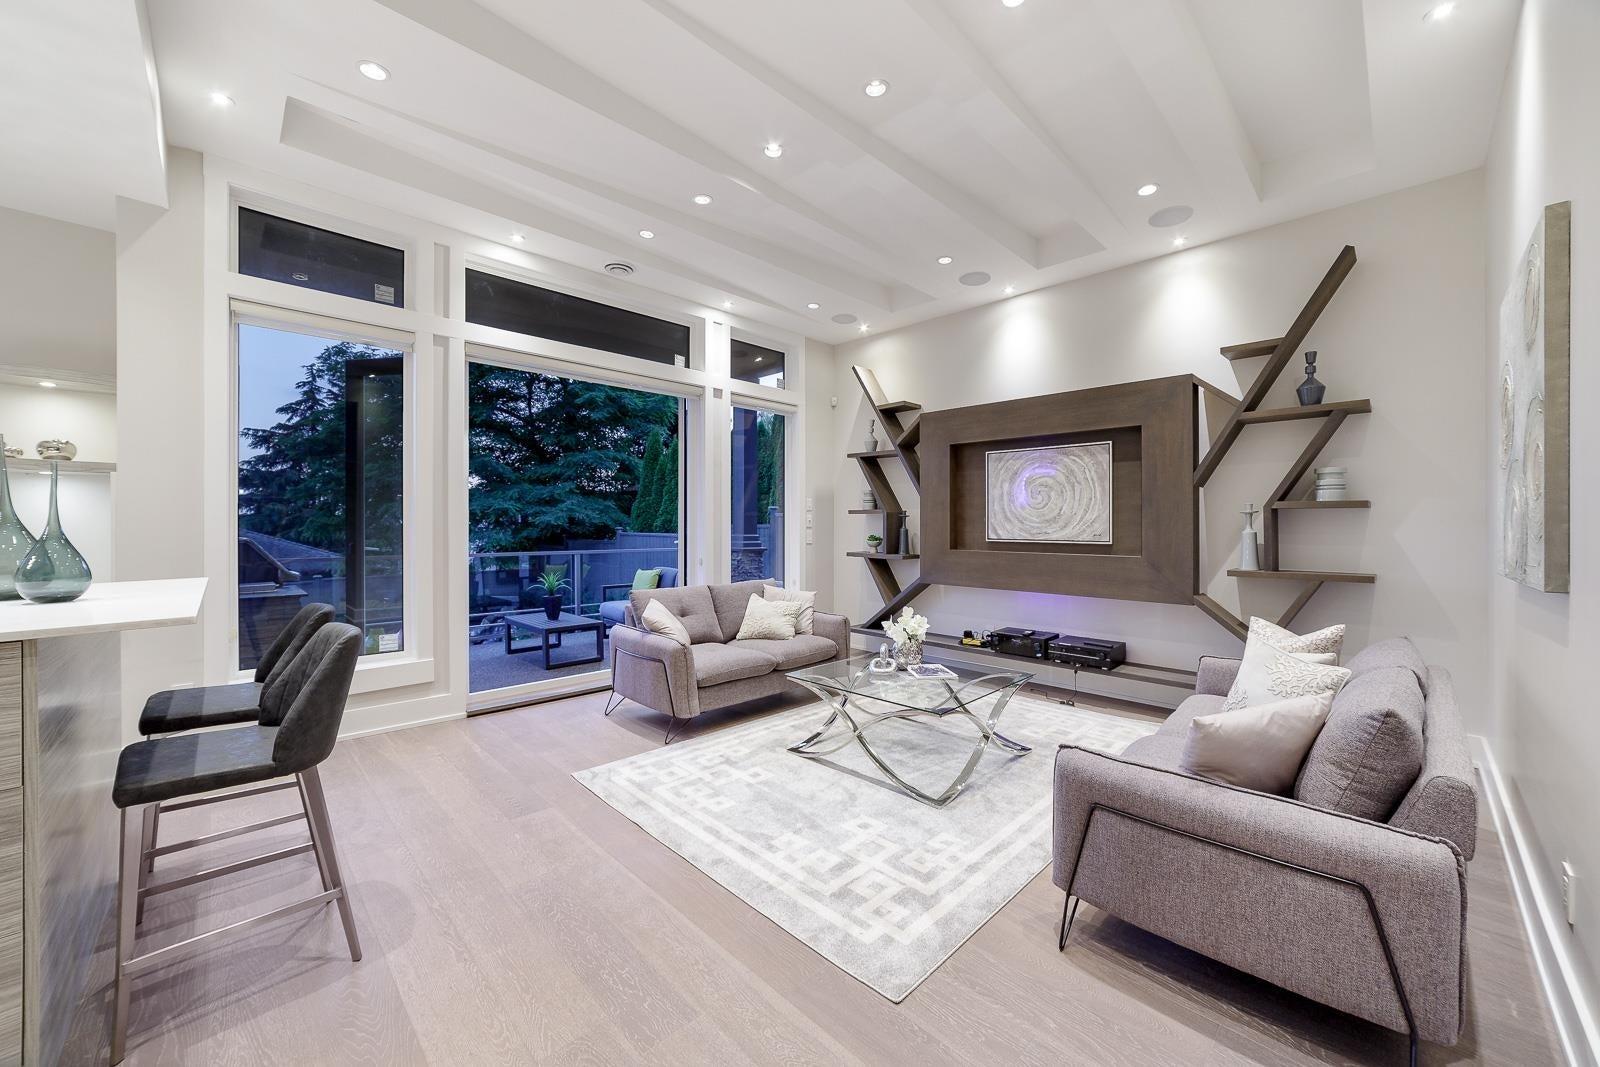 517 GRANADA CRESCENT - Upper Delbrook House/Single Family for sale, 8 Bedrooms (R2615057) - #6